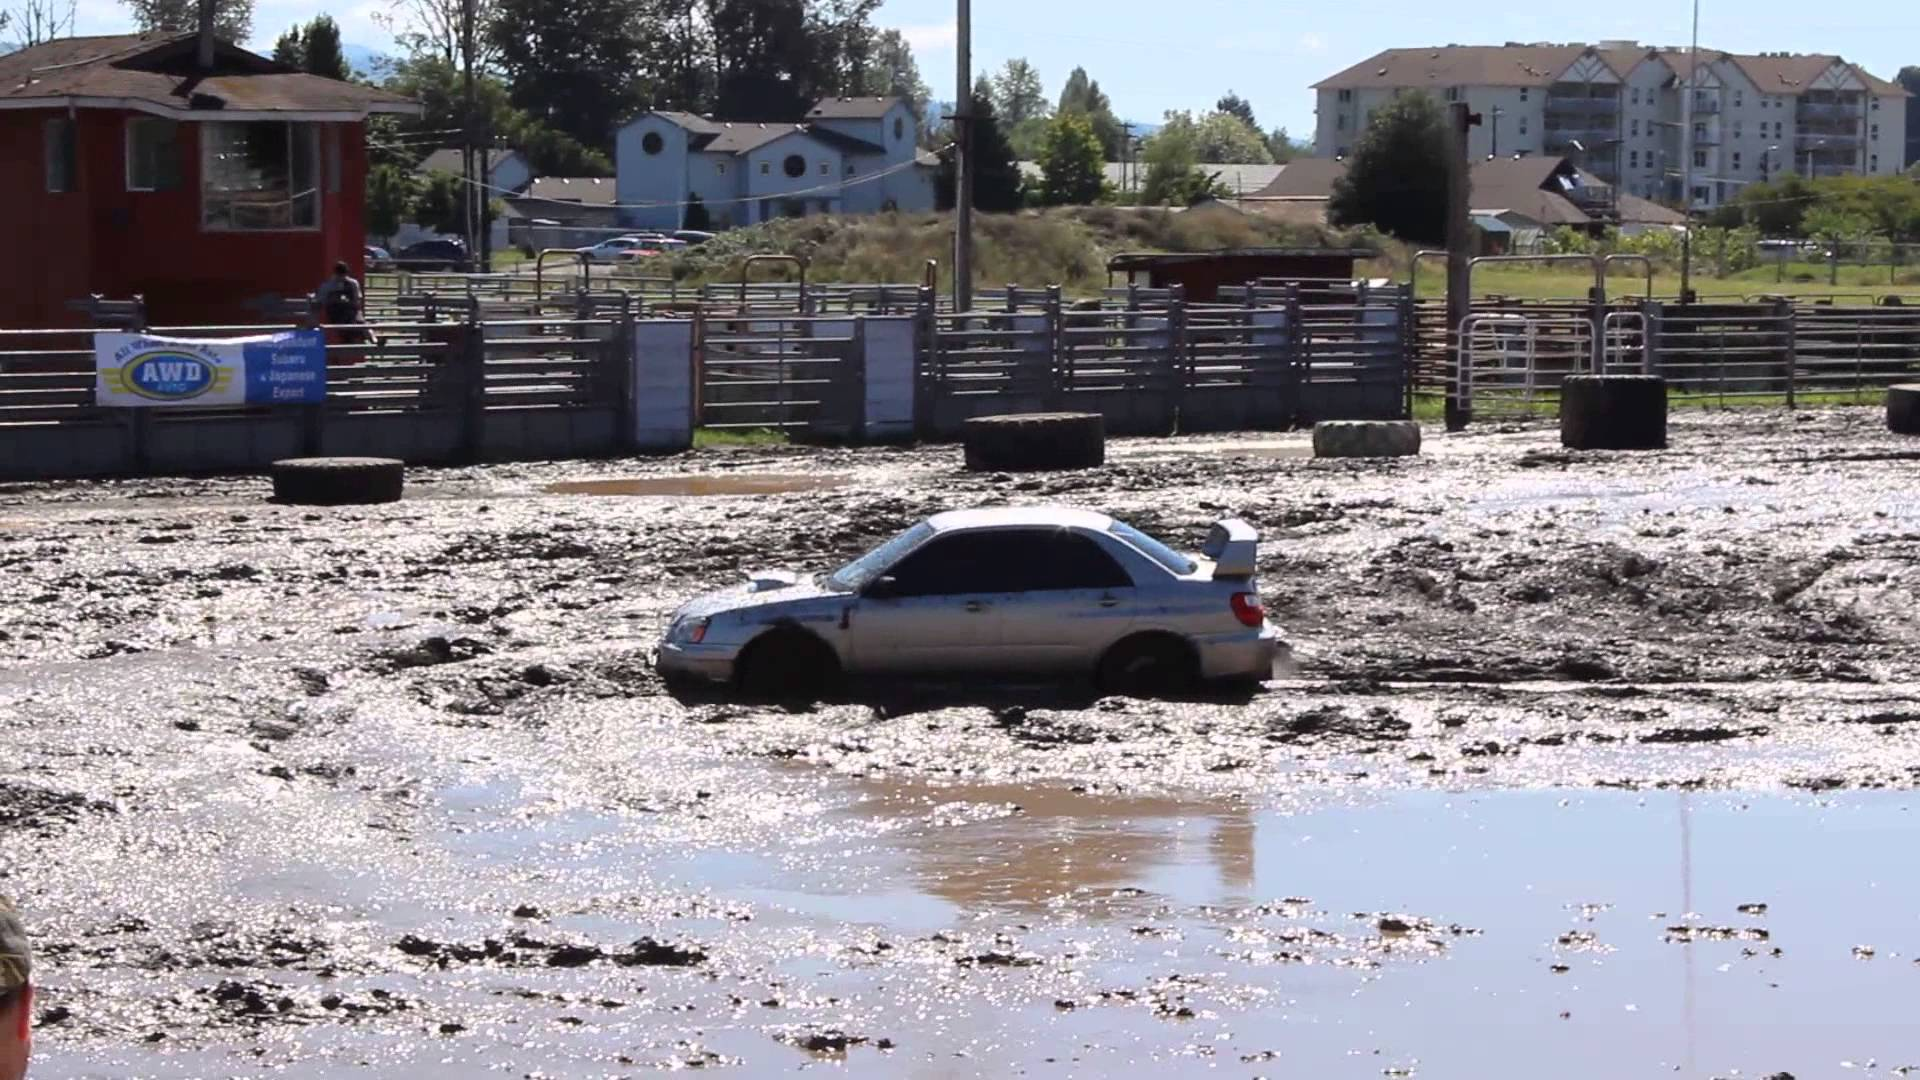 Subar Impreza WRX STI cīņa ar dubļiem. (Subaru Impreza WRX STI on mud pit)